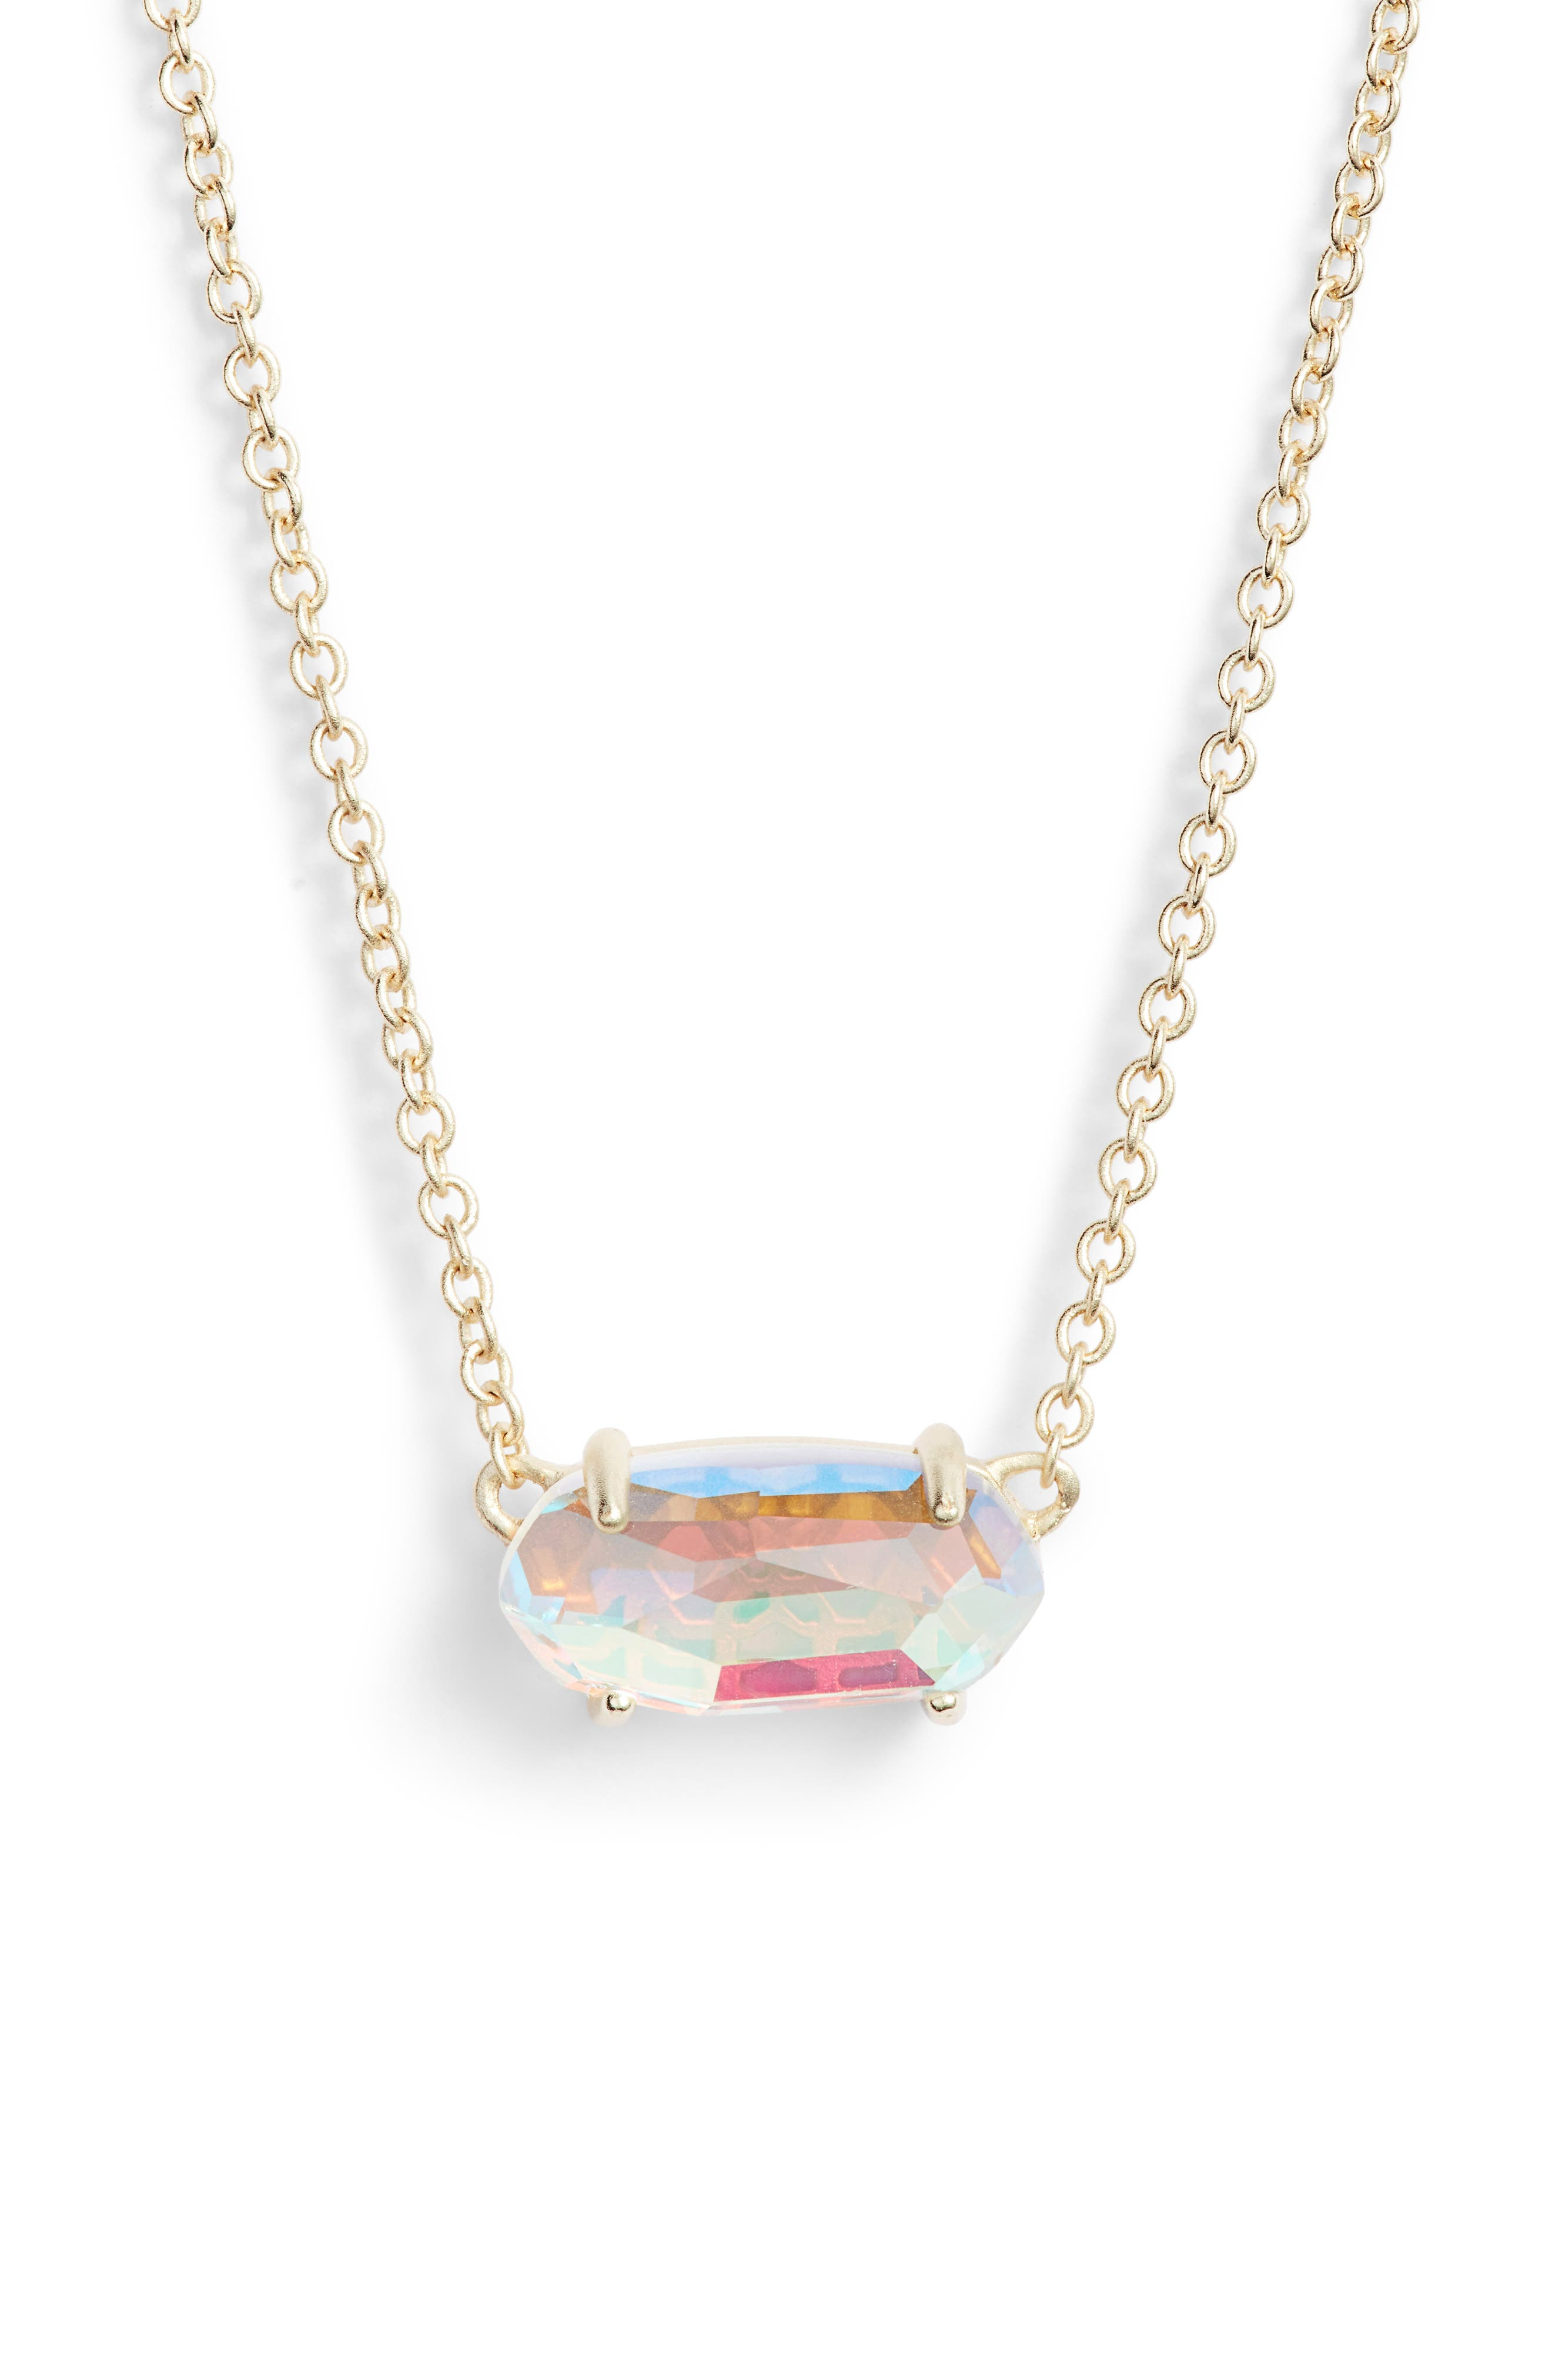 Ever Pendant Necklace,                             Main thumbnail 1, color,                             DICHROIC GLASS/ GOLD